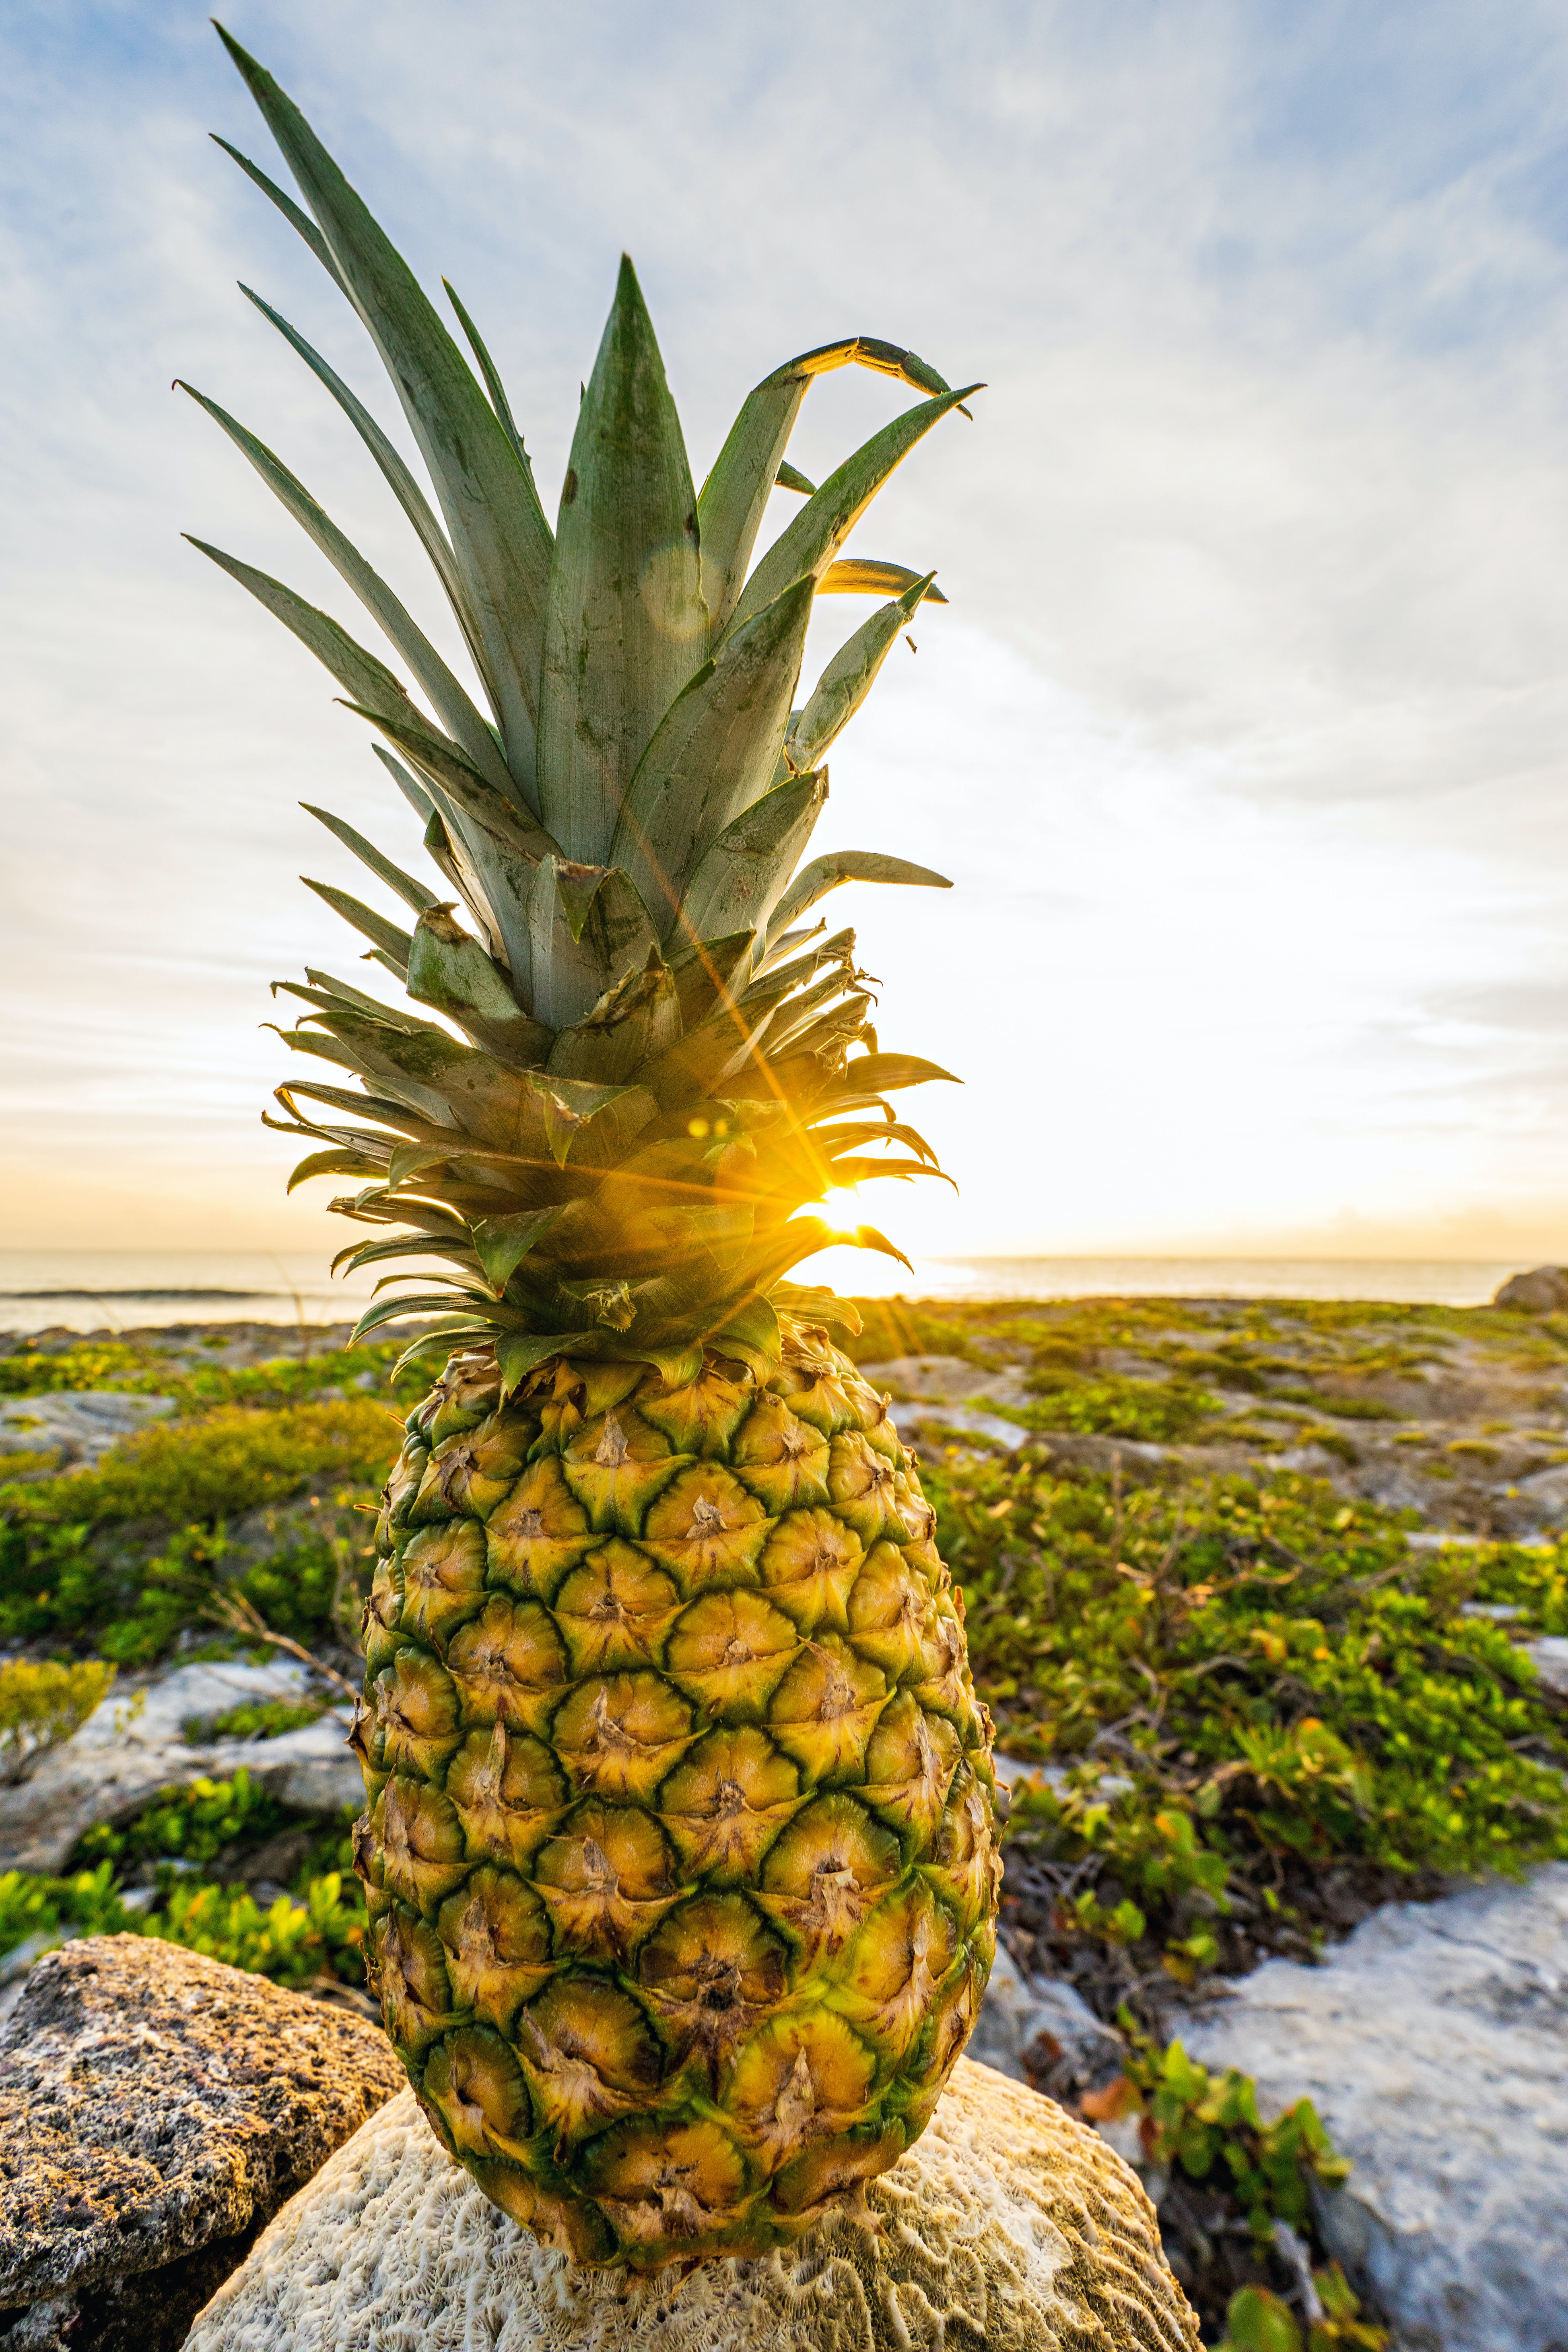 Pineapple Fruit on Rock Taken Under White Clouds